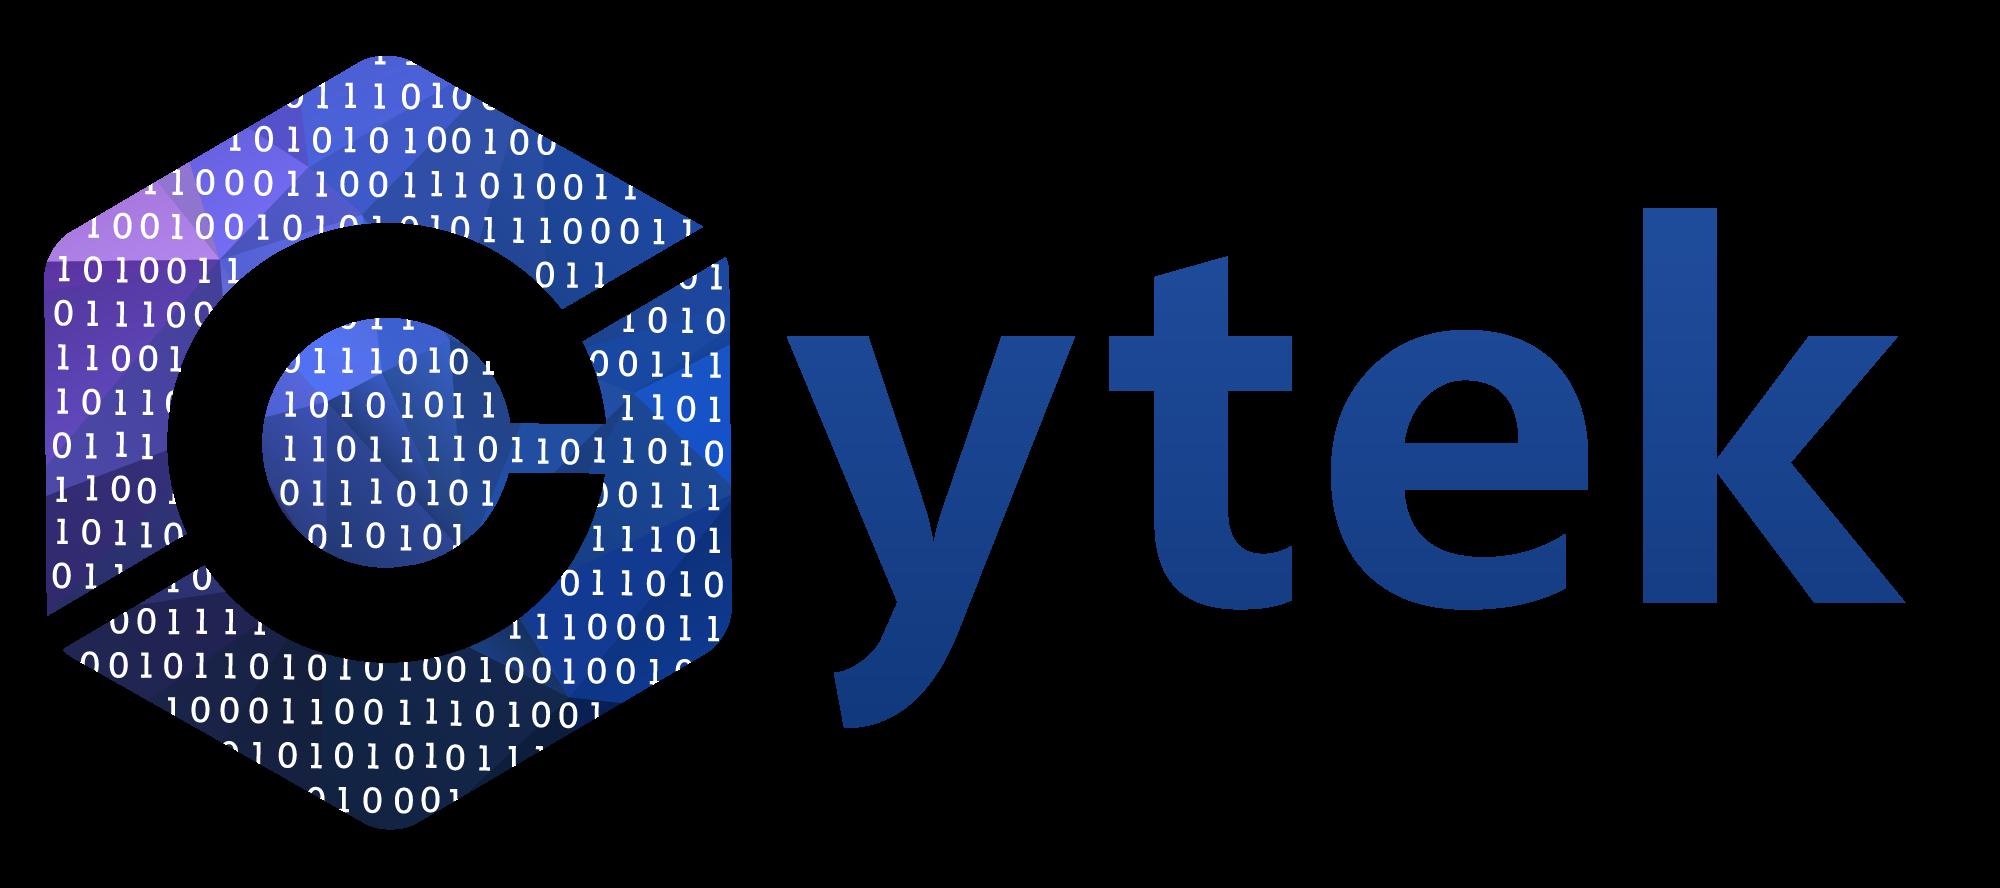 Cytek_Logo.png